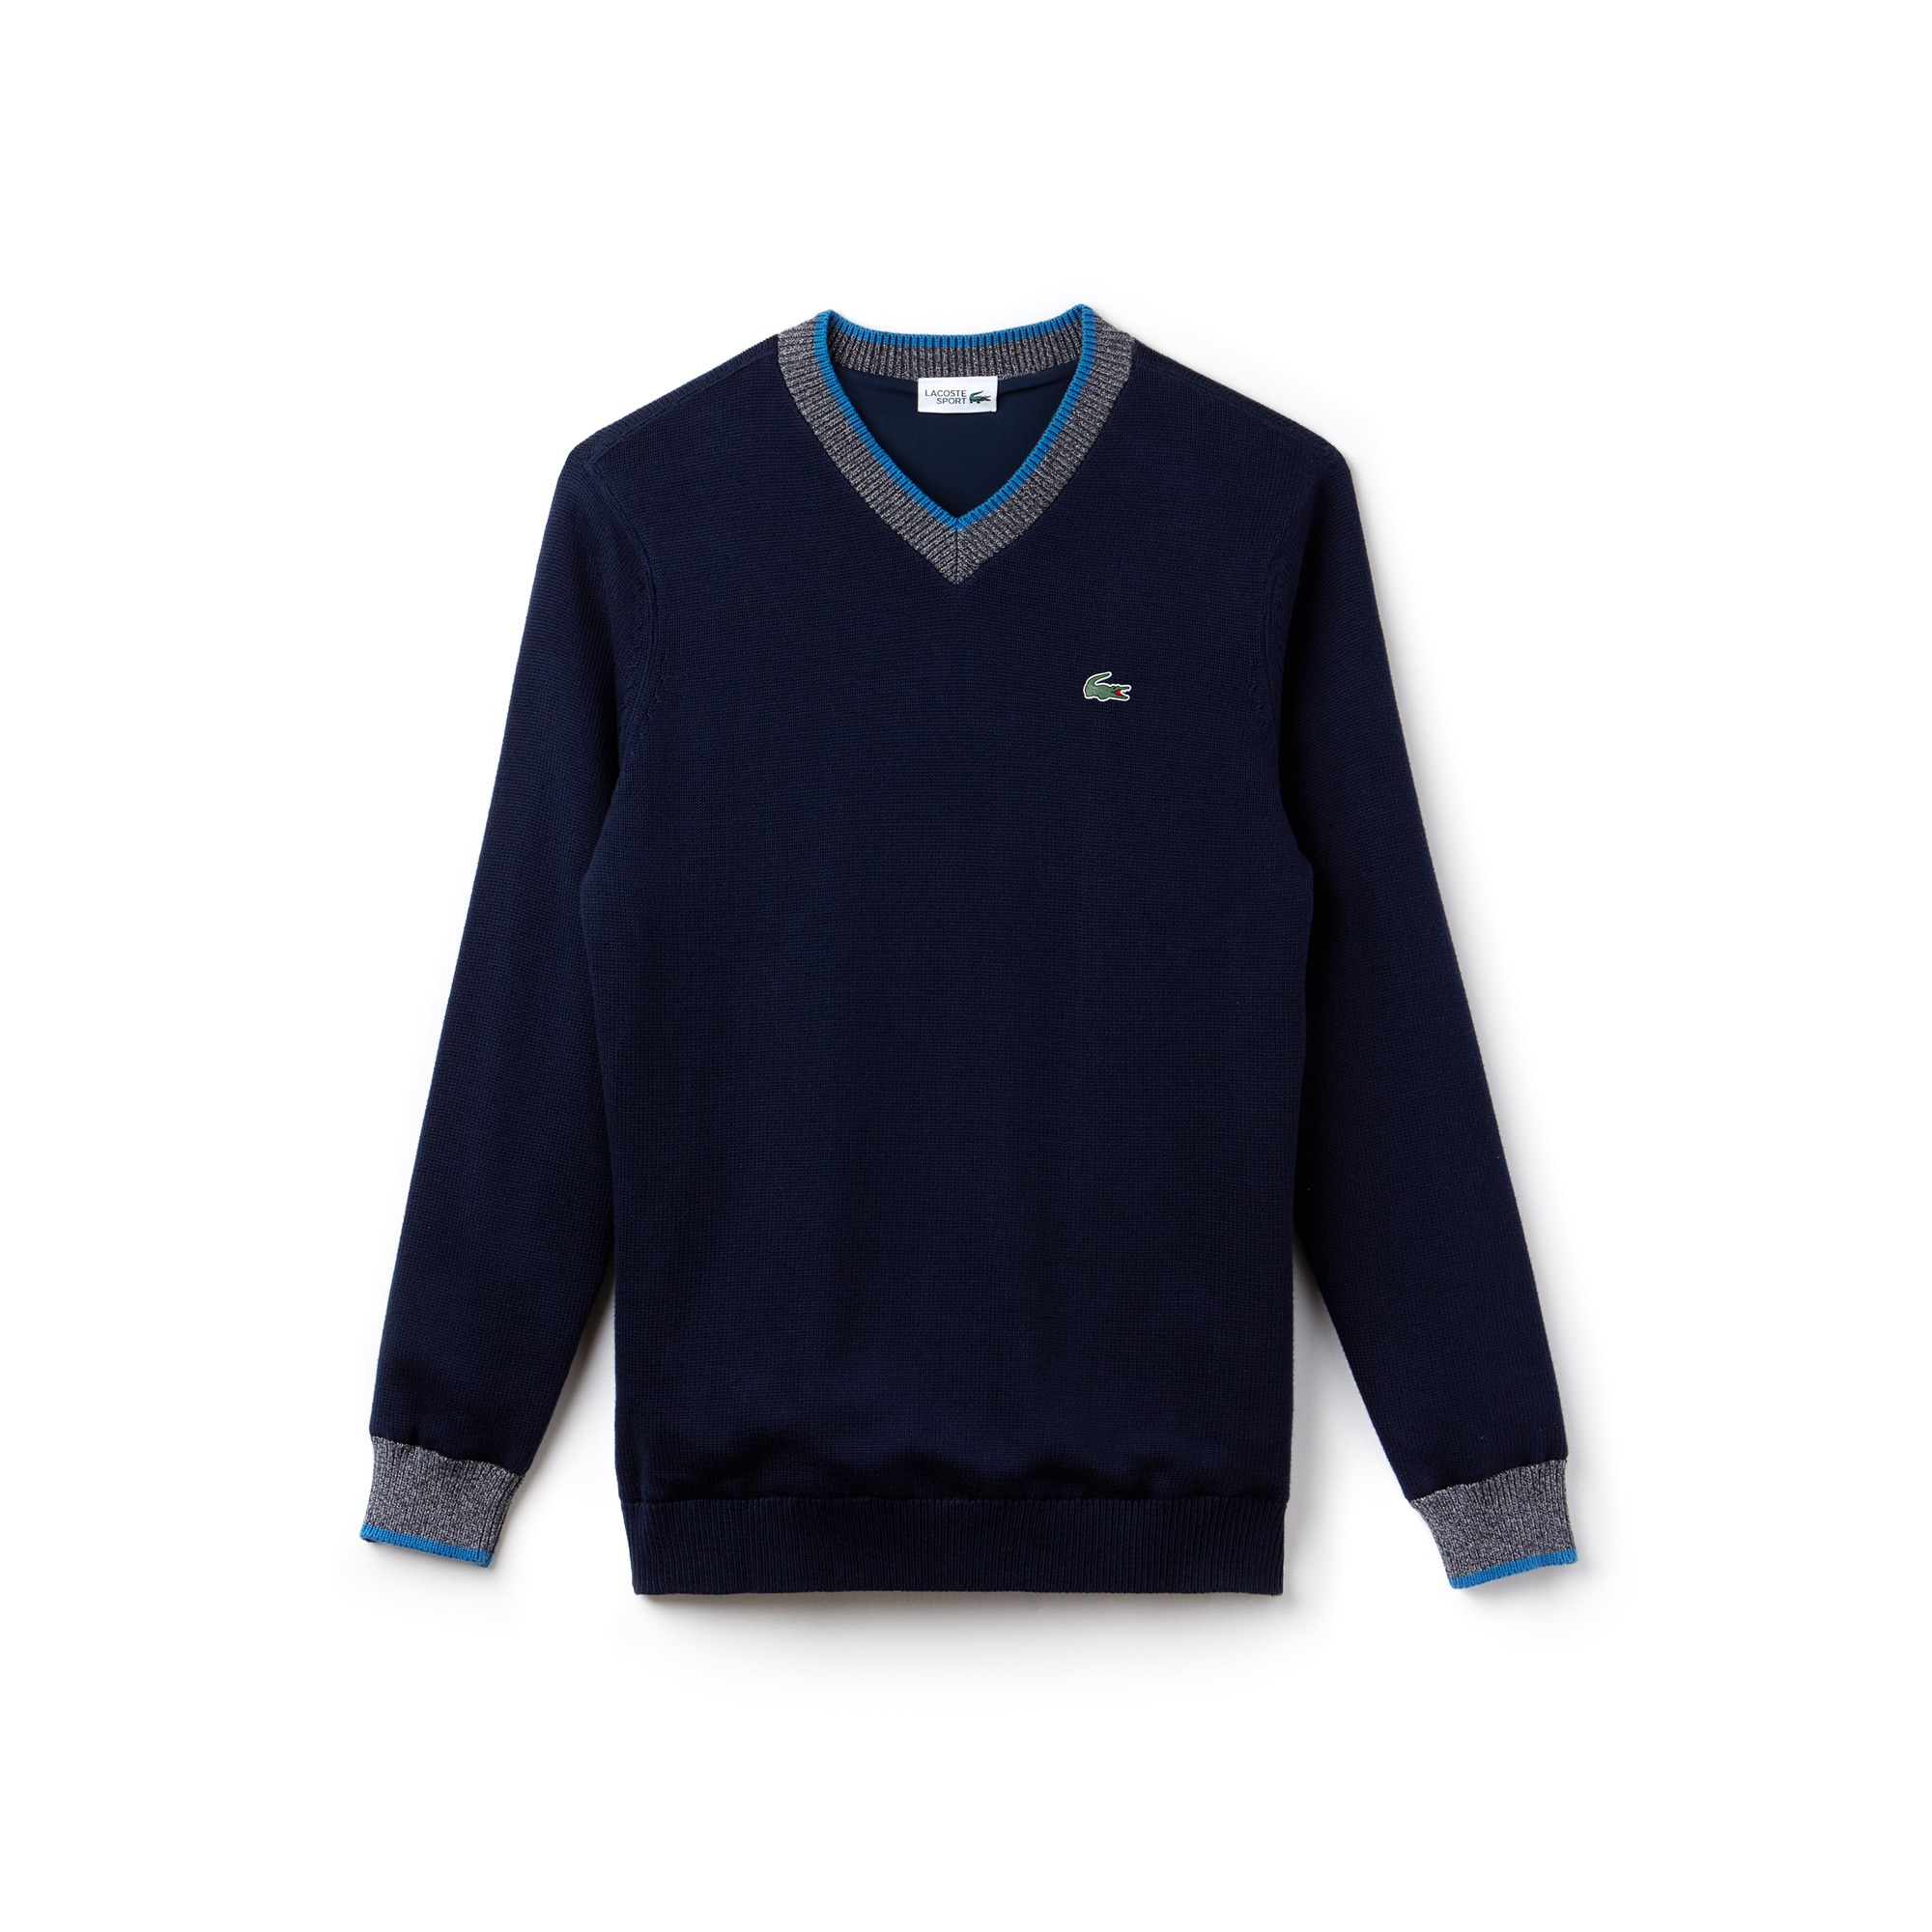 Jersey de cuello en V Golf Lacoste SPORT en malla técnica de algodón liso